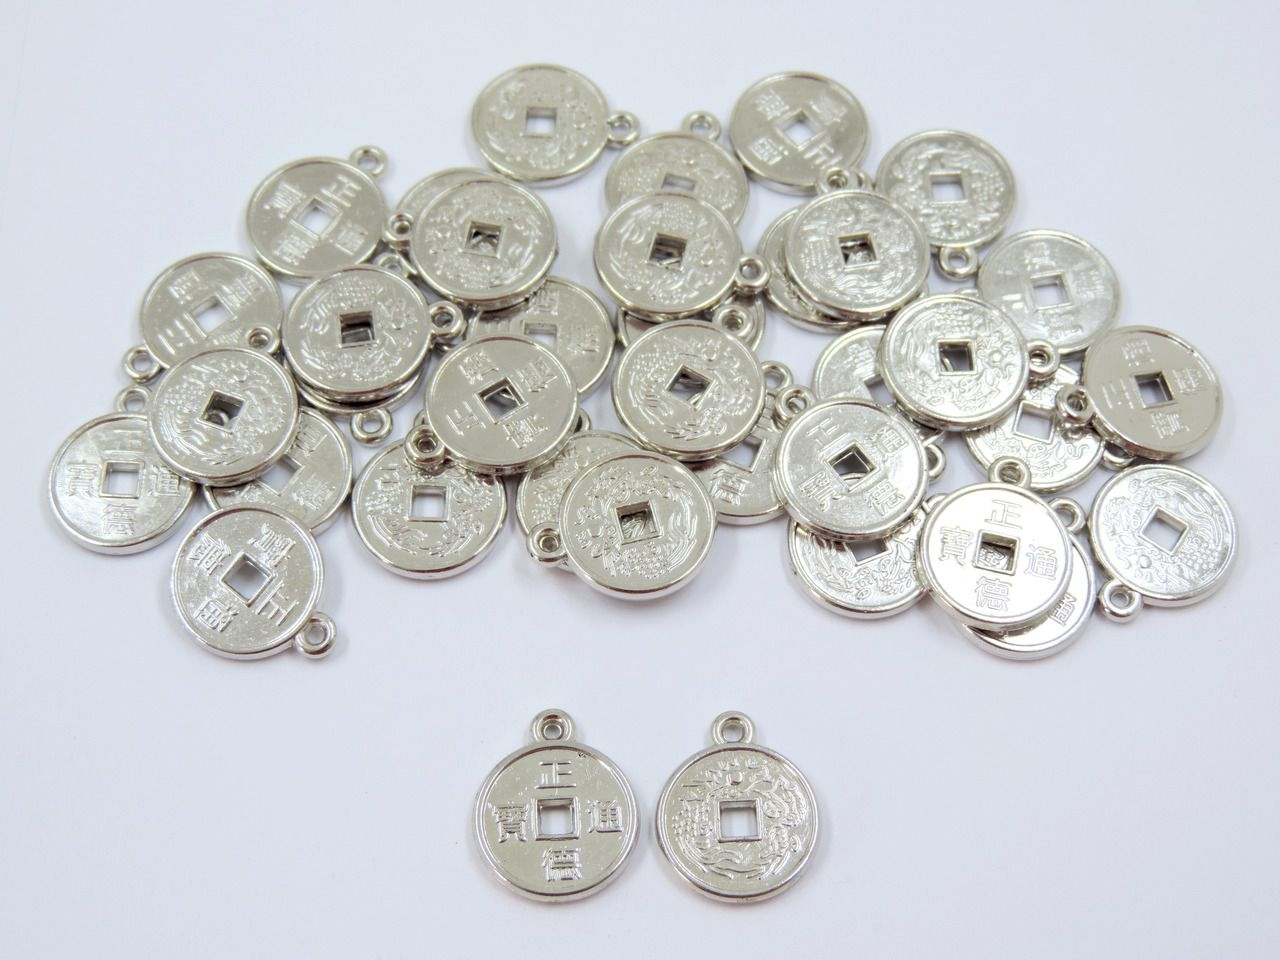 pingente medalha chinesa da sorte prata 15mm 50 unidades